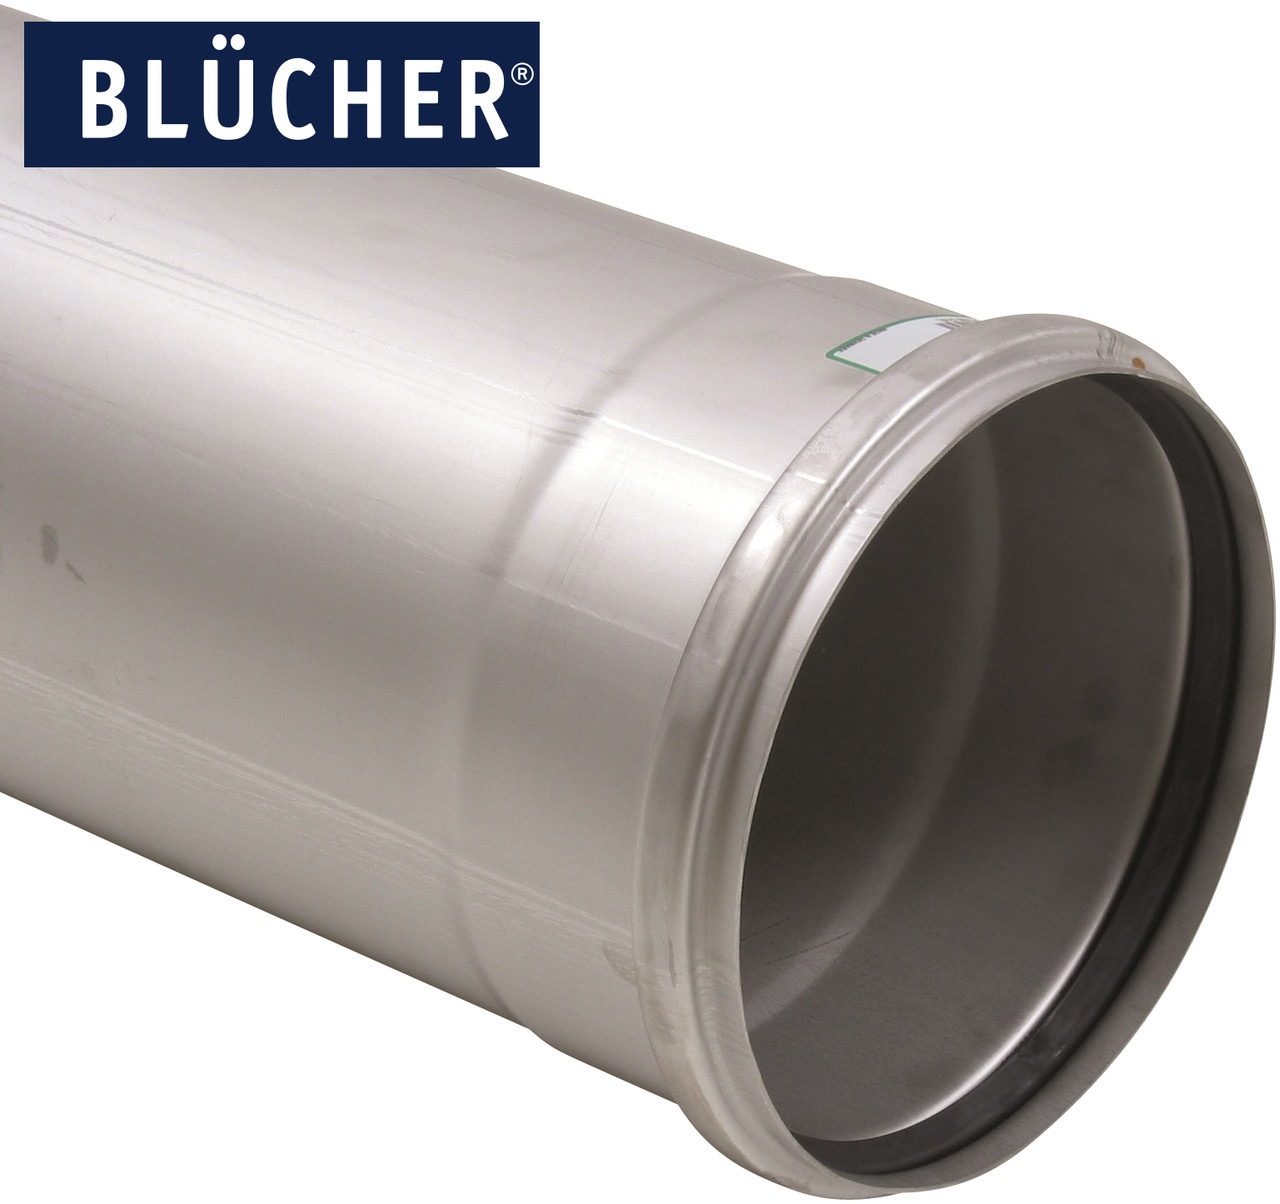 Каналізаційна труба BLUCHER з нержавіючої сталі AISI304 / AISI316L, 3000мм, DN200